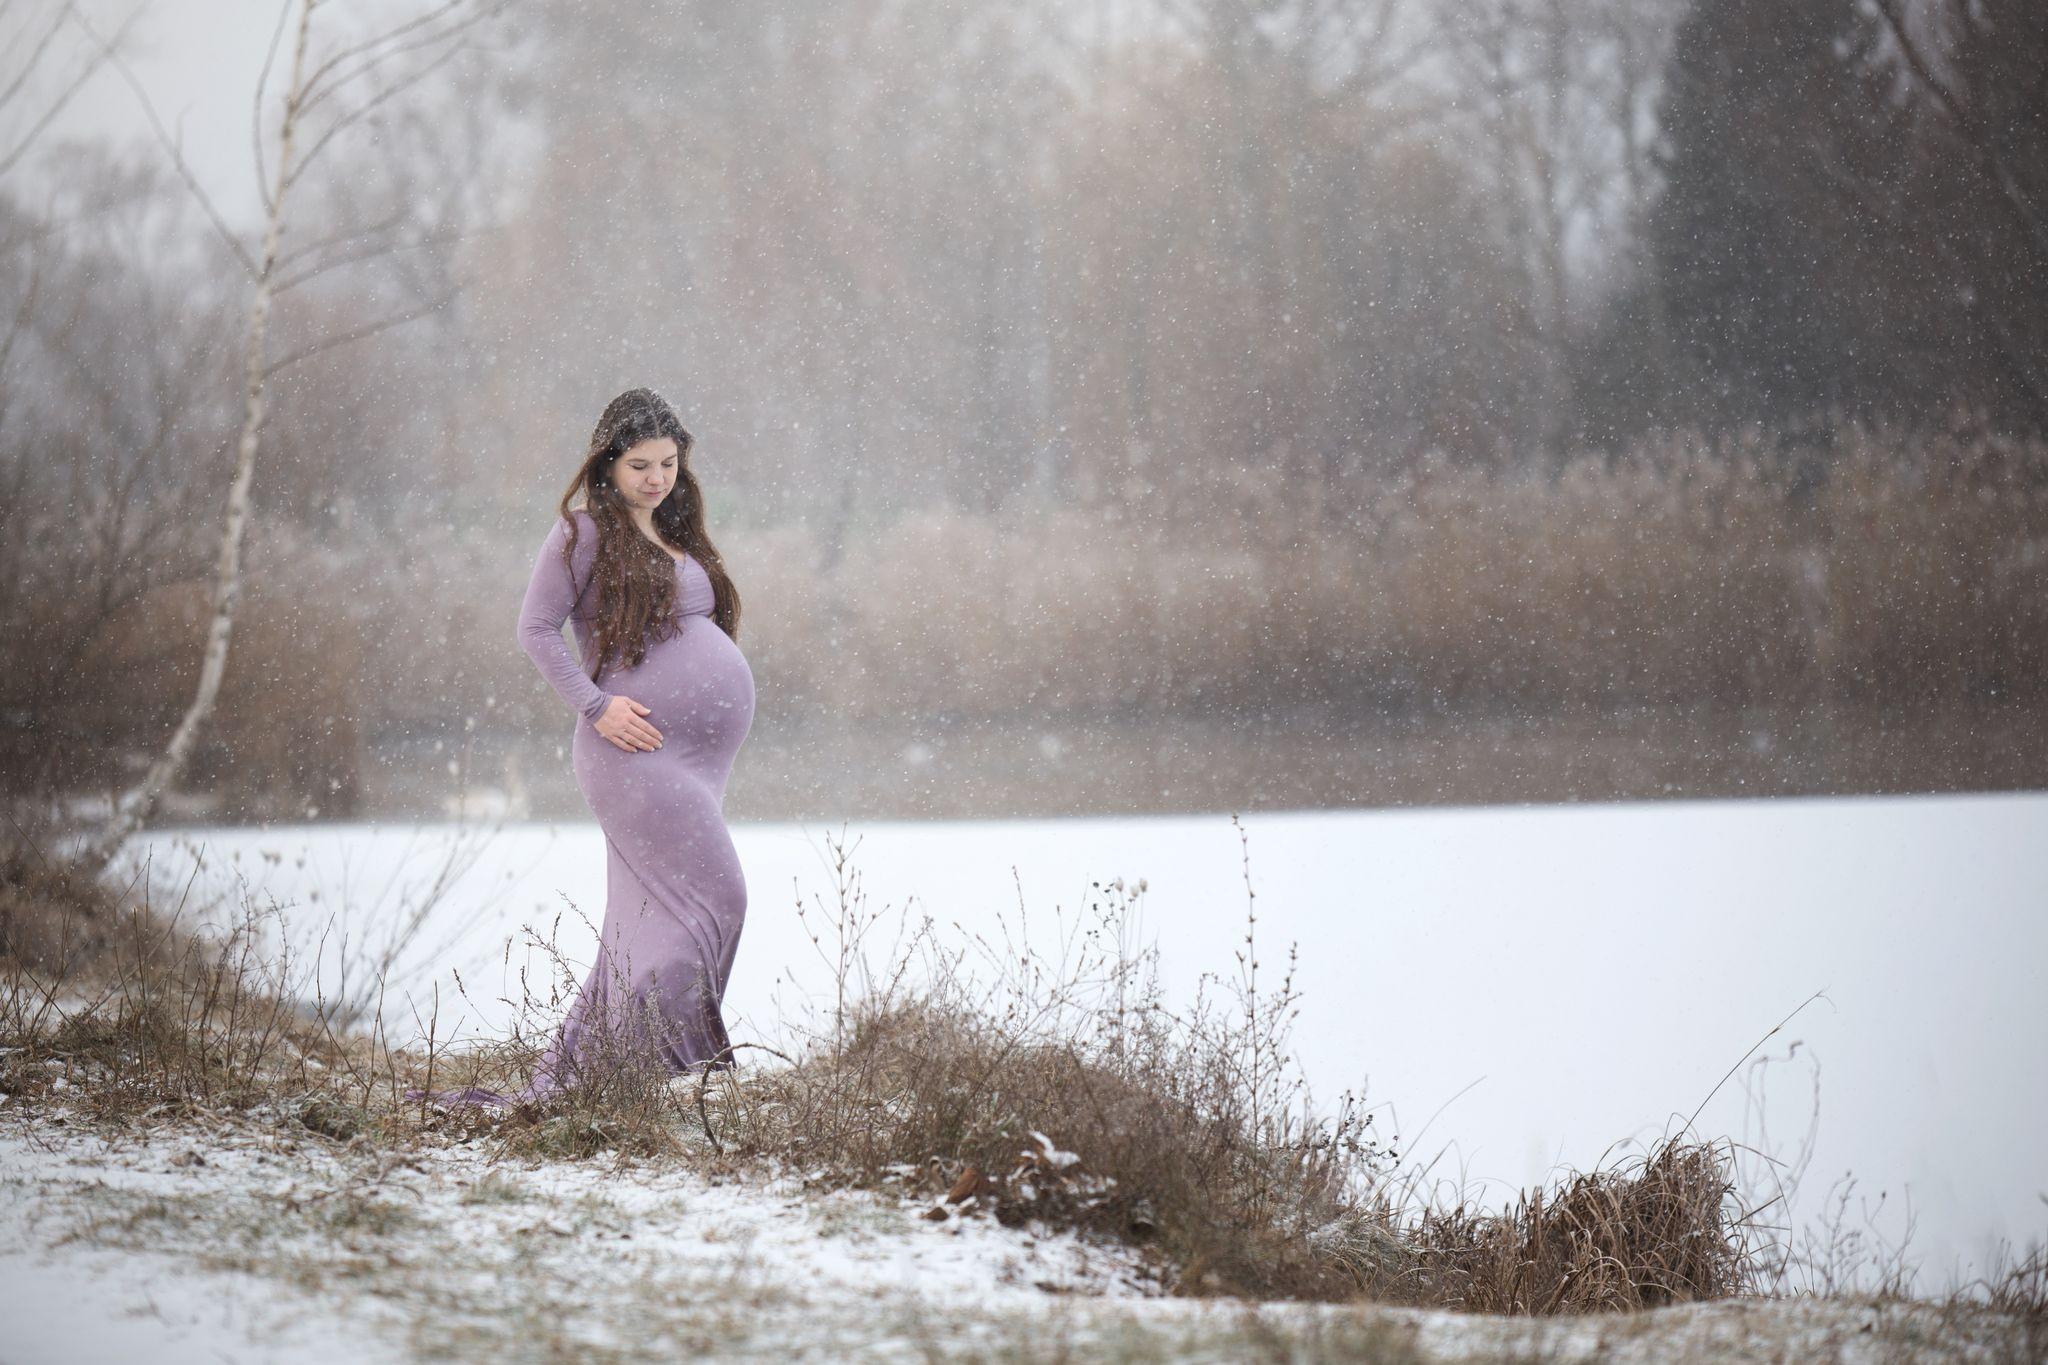 Outdoor Fotoshooting Schwangerschaftskleider